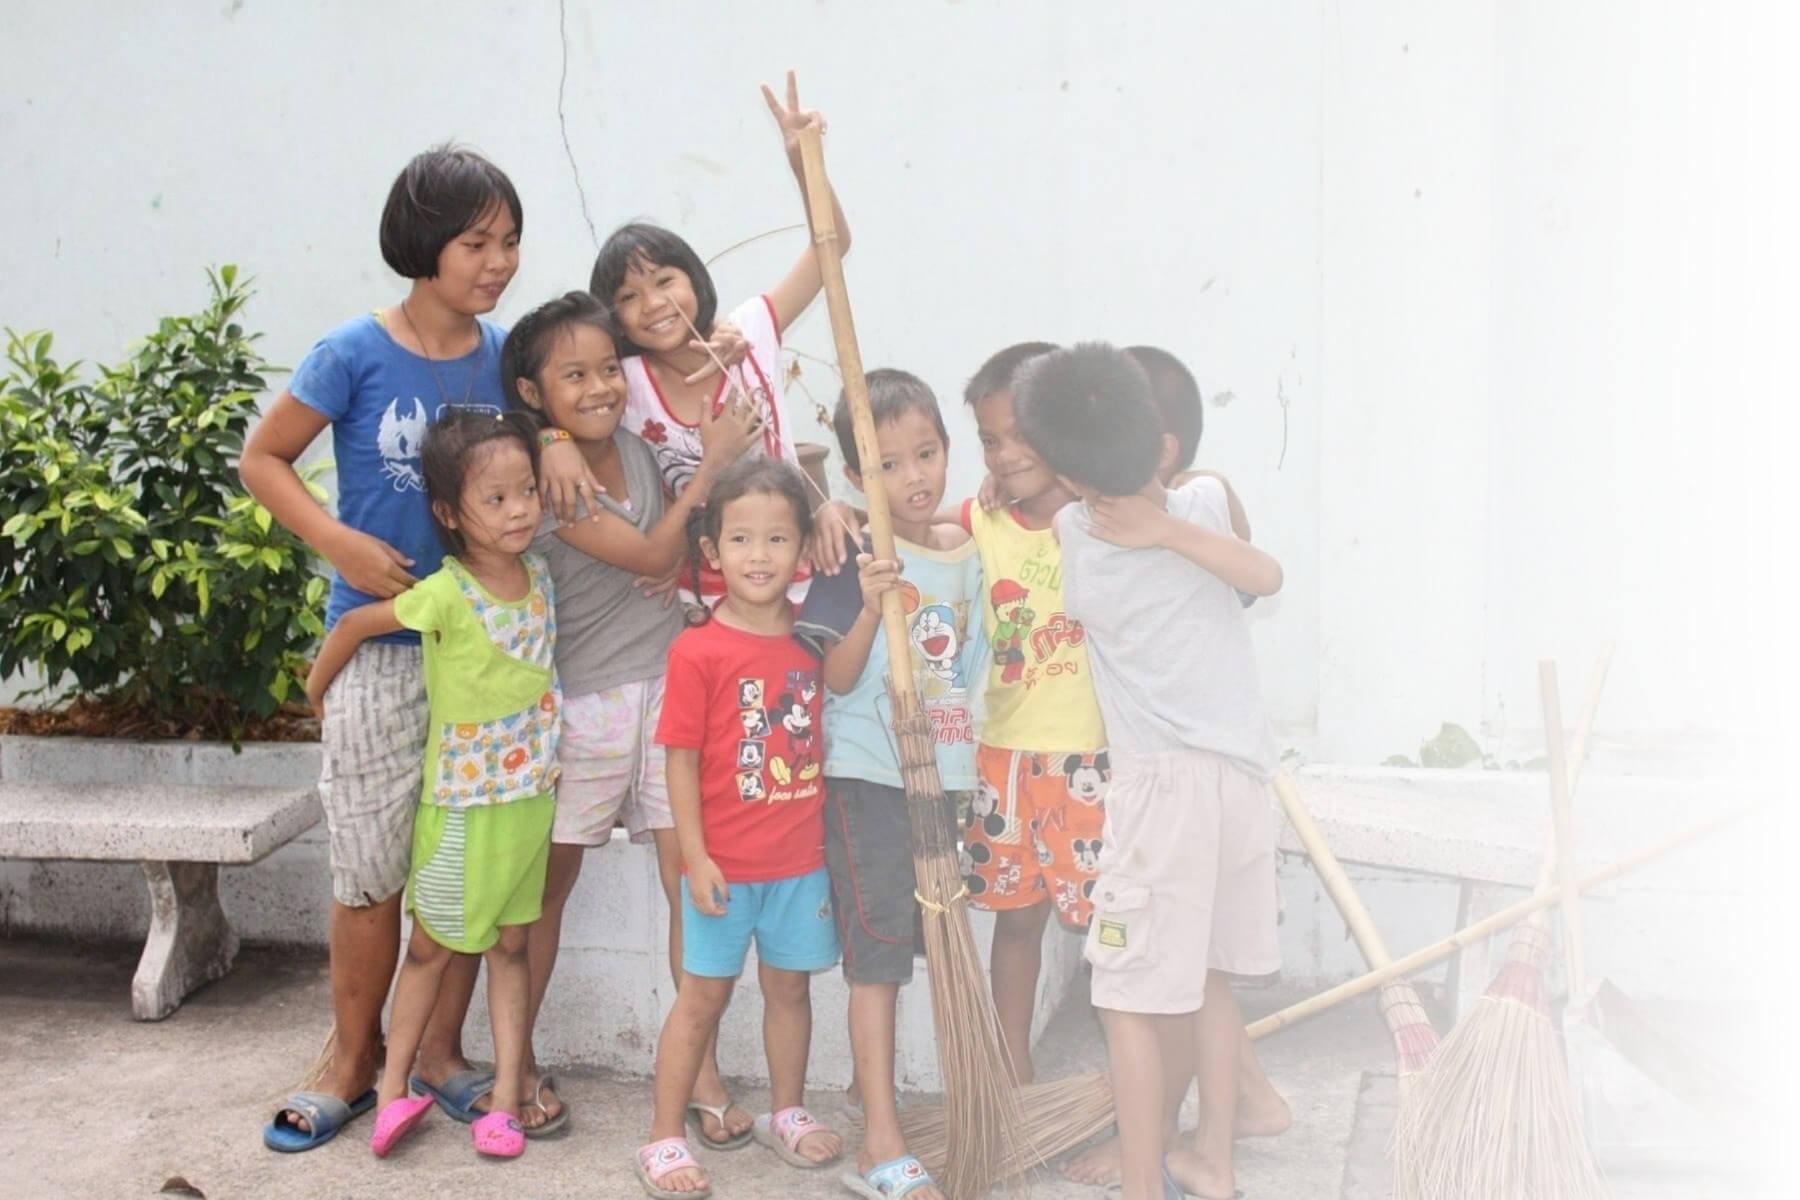 Kids in Phuket